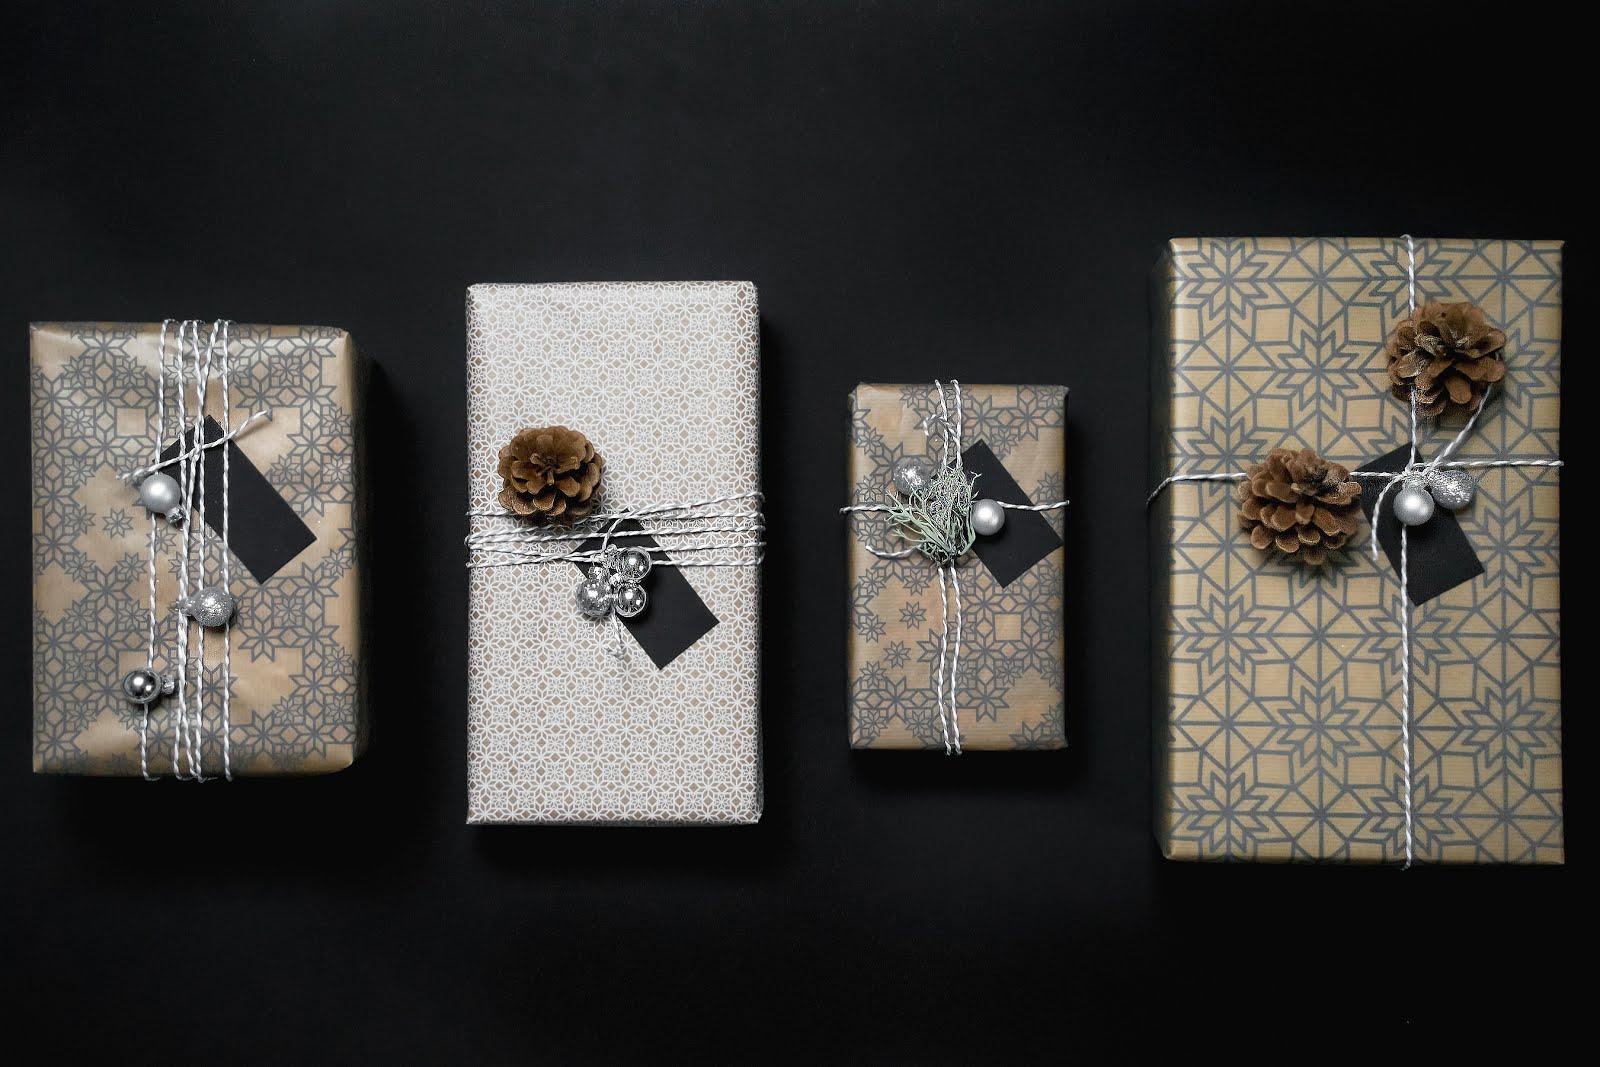 Ikea vinter 2017, Gift wrapping ideas, inspiration, inpak ideeen, simple, minimal, eenvoudig, dennenappels, interieur